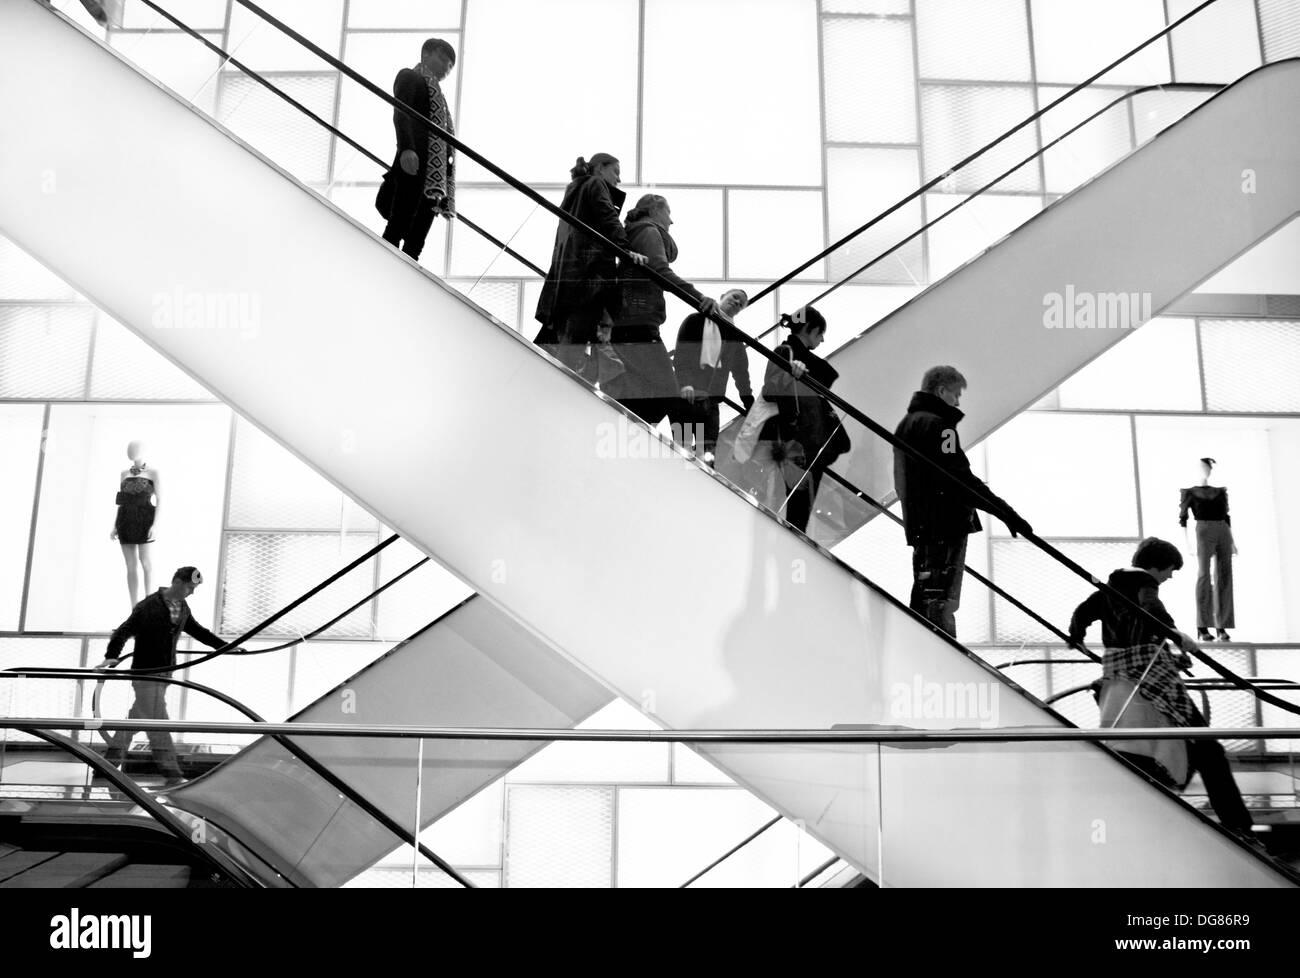 shopping center escalators stark black and white,Crowd And Escalator - Stock Image